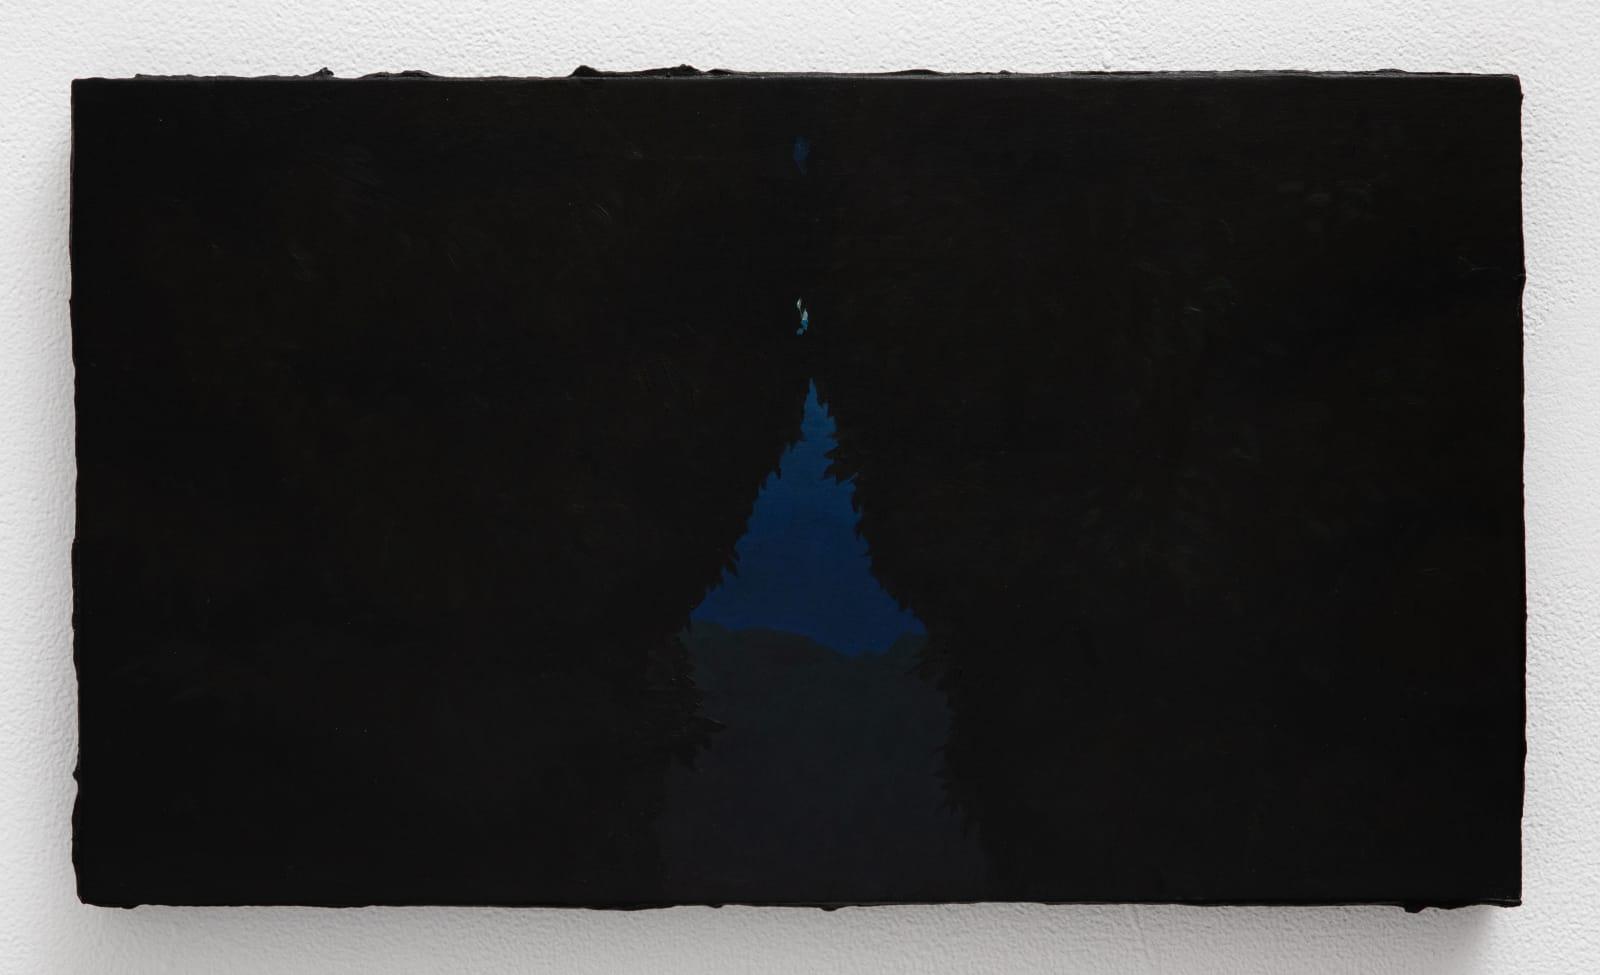 Sarah Schlesinger, The Vista, 2021